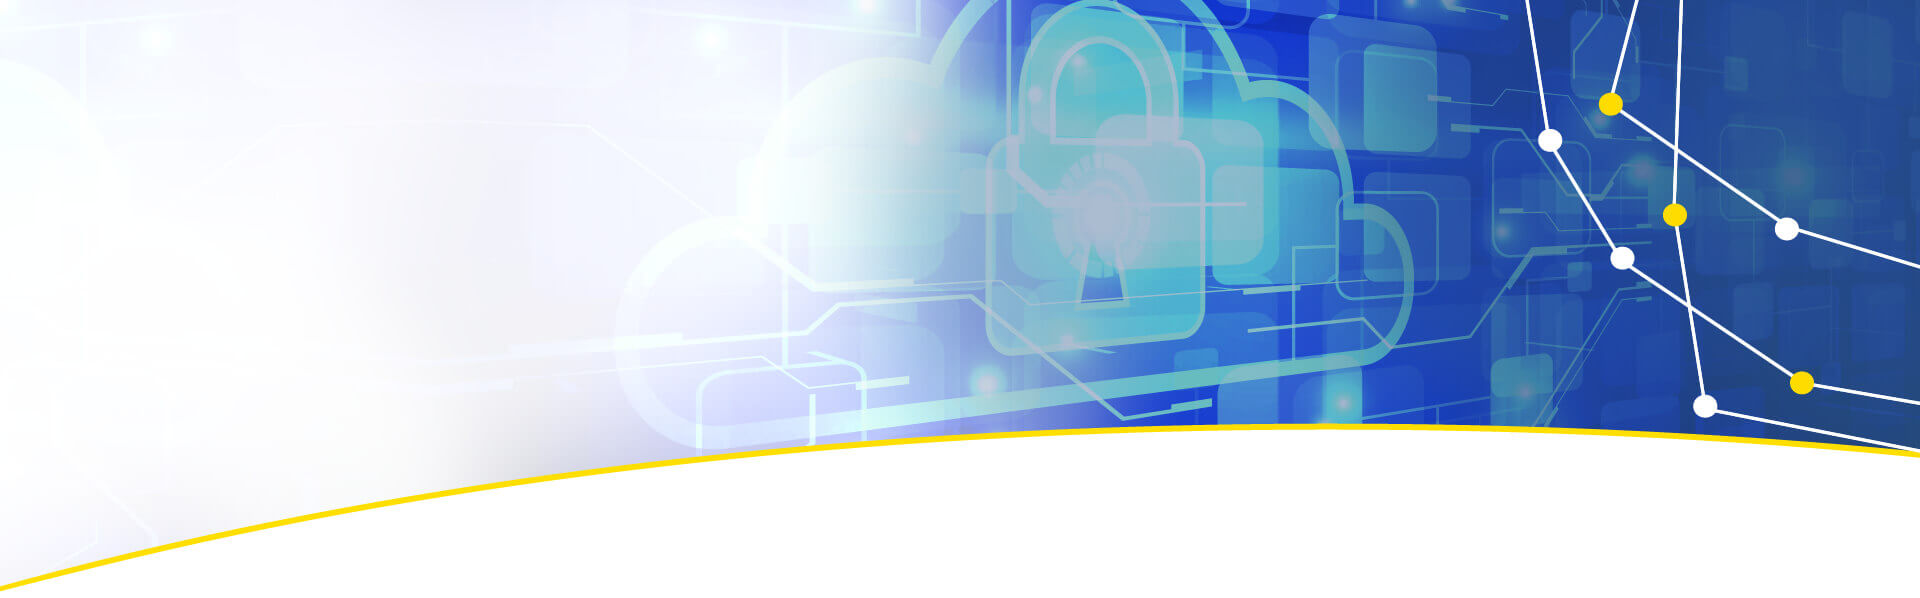 CMC Networks Request a callback 1920x598